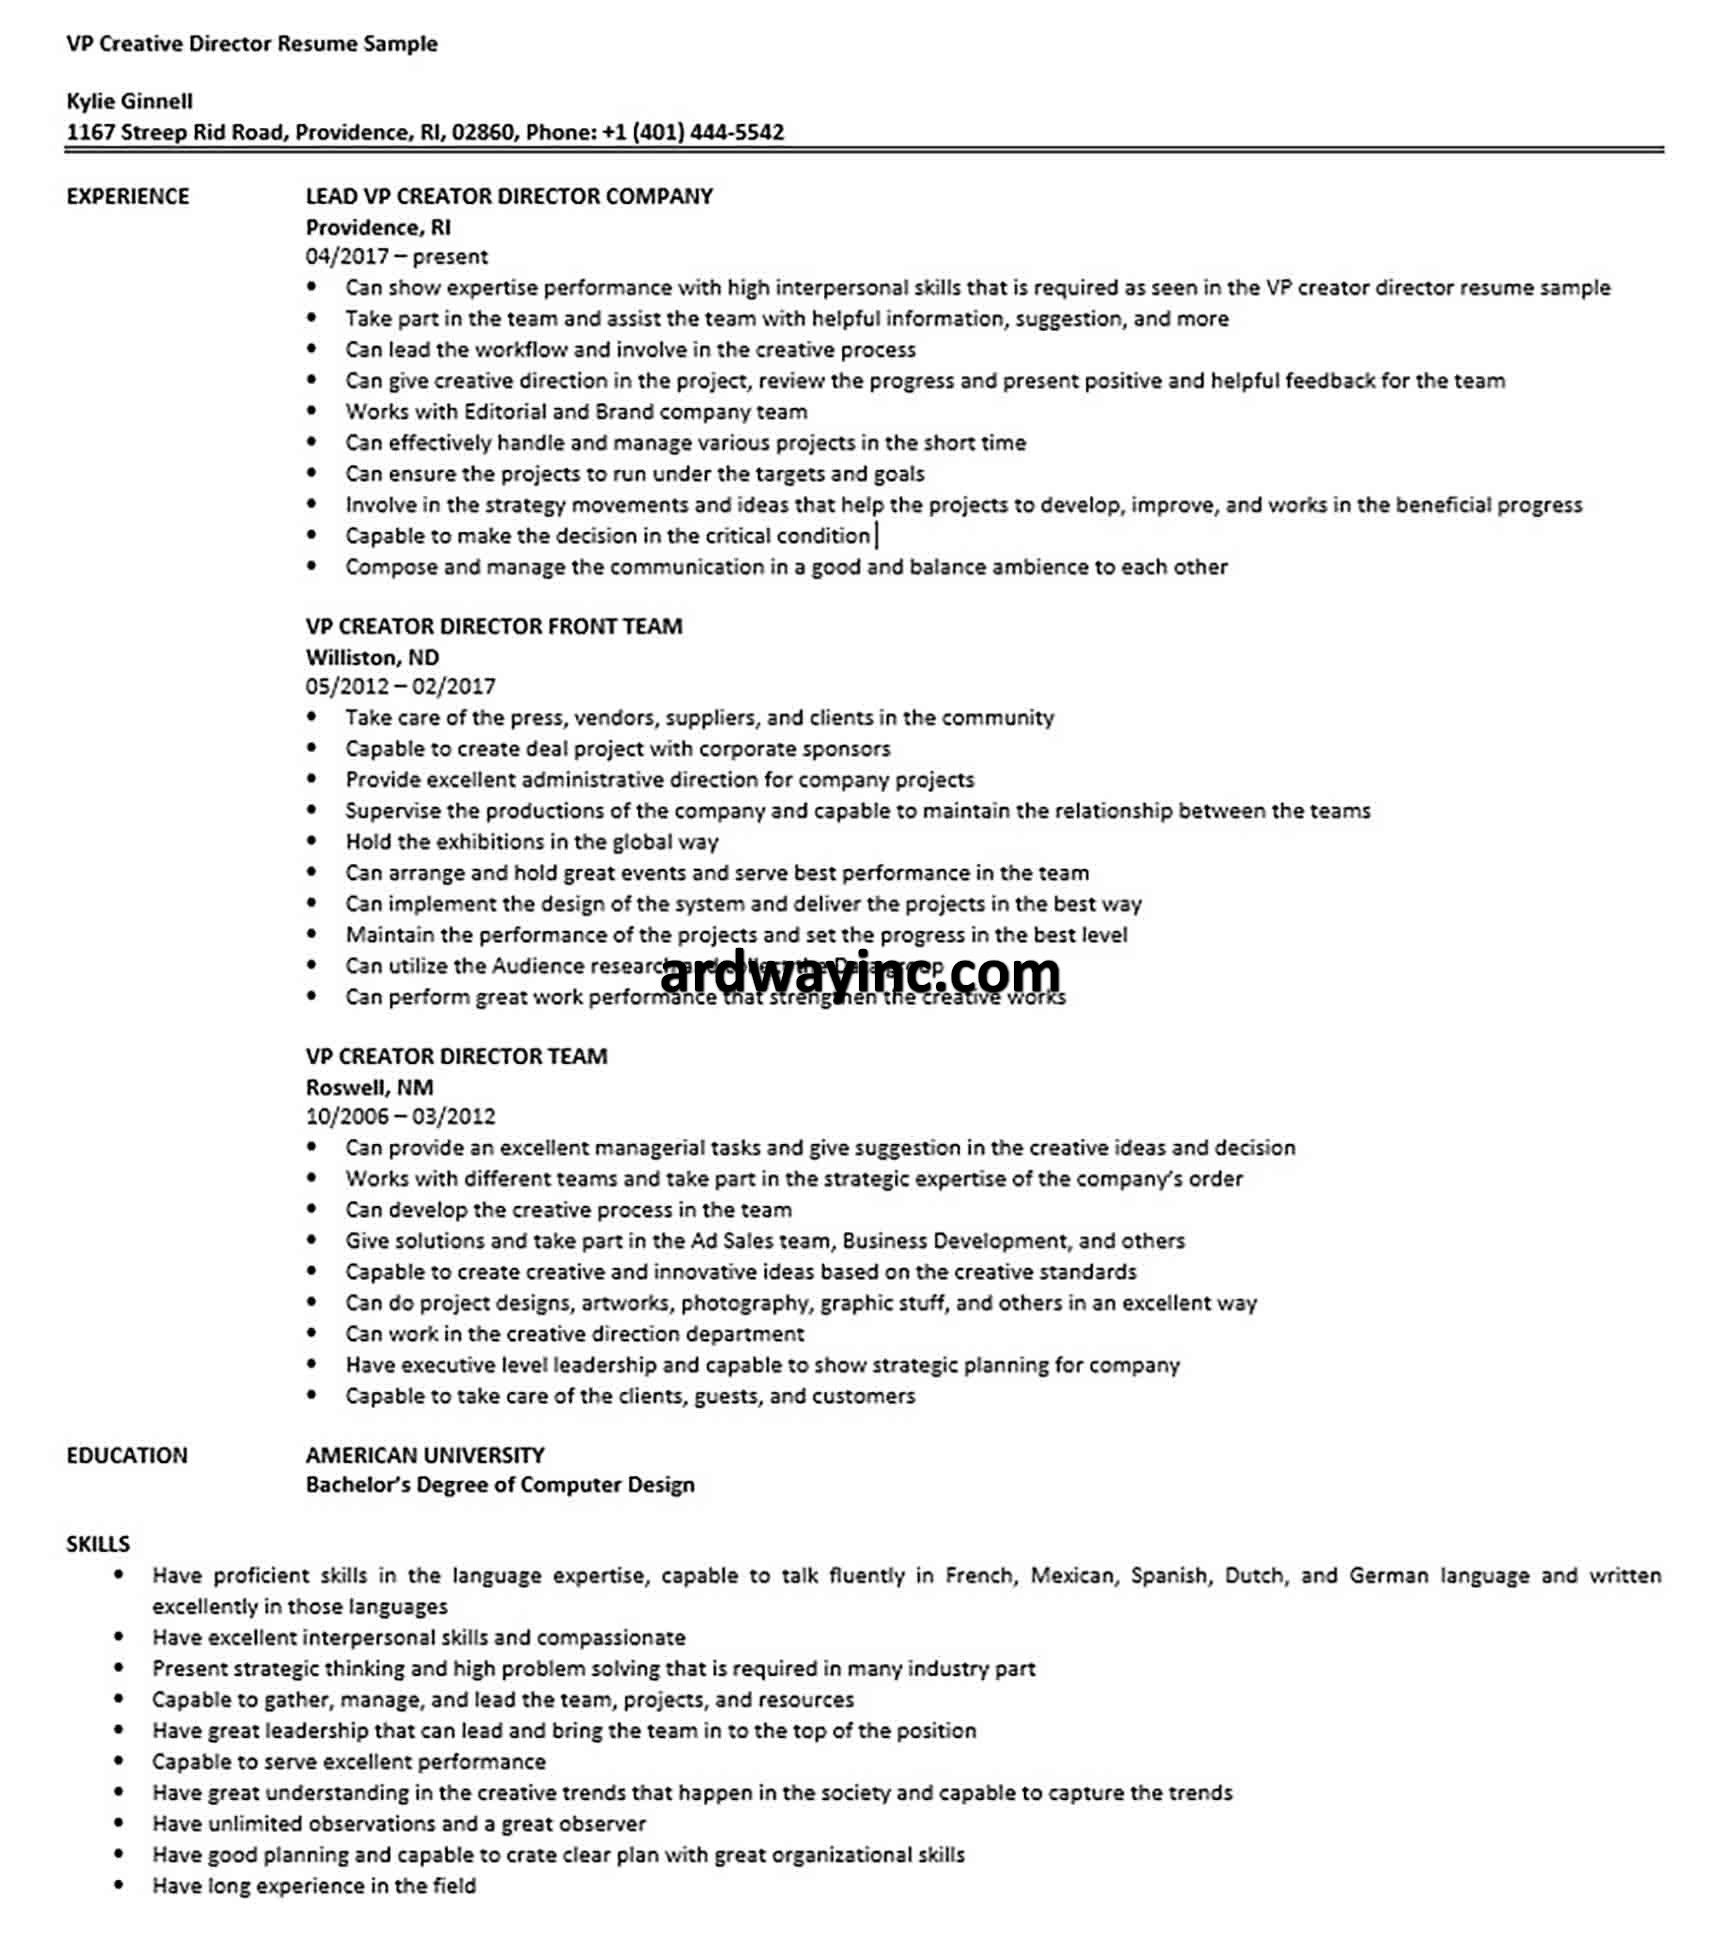 Vp Creative Director Resume Sample Interpersonal Skills Resume Creative Director